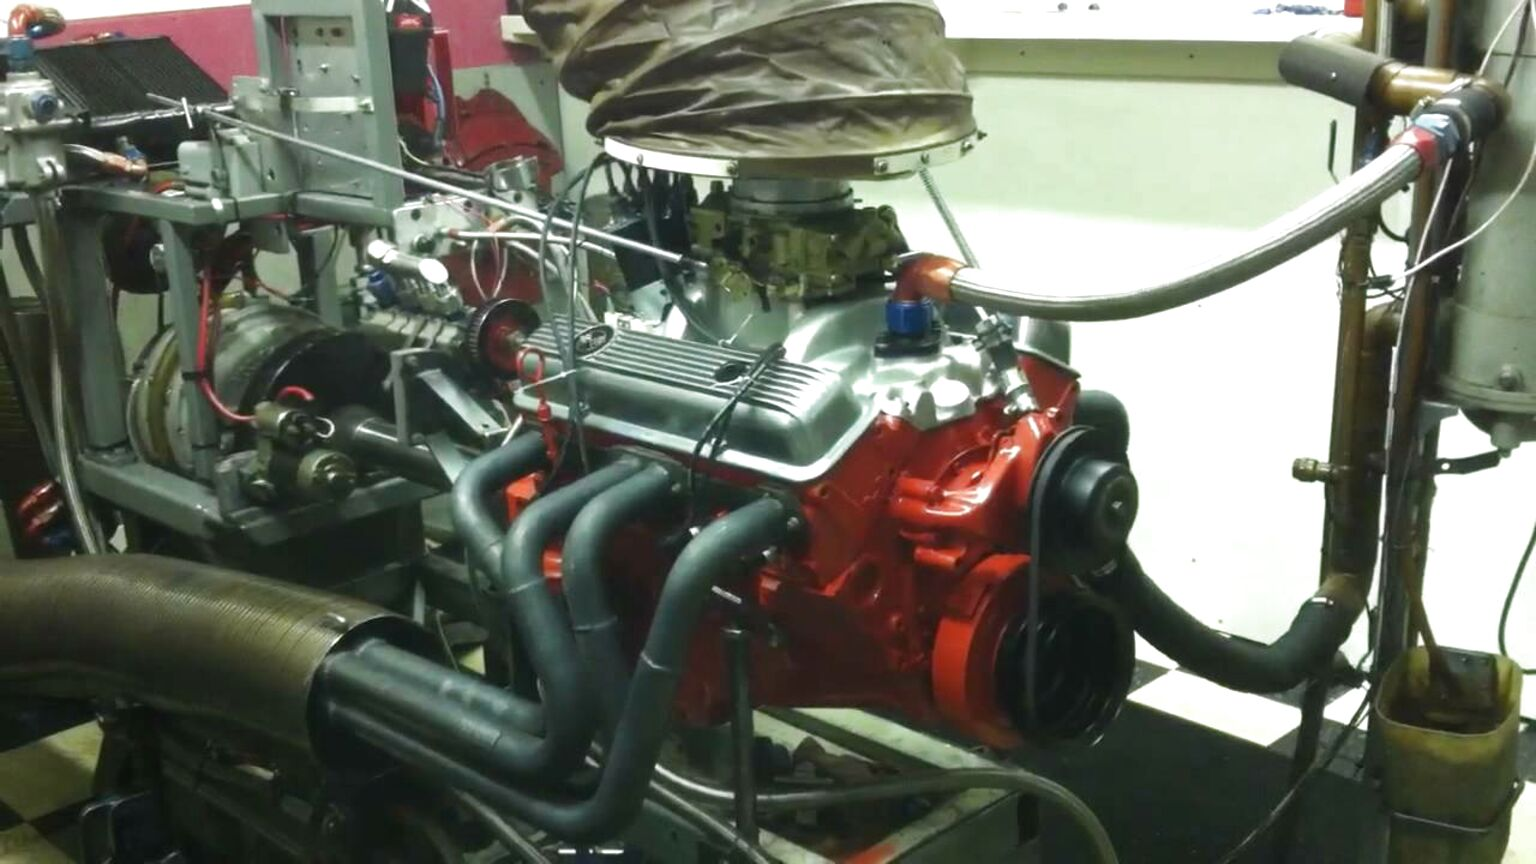 Lt1 Engine For Sale Only 2 Left At 60